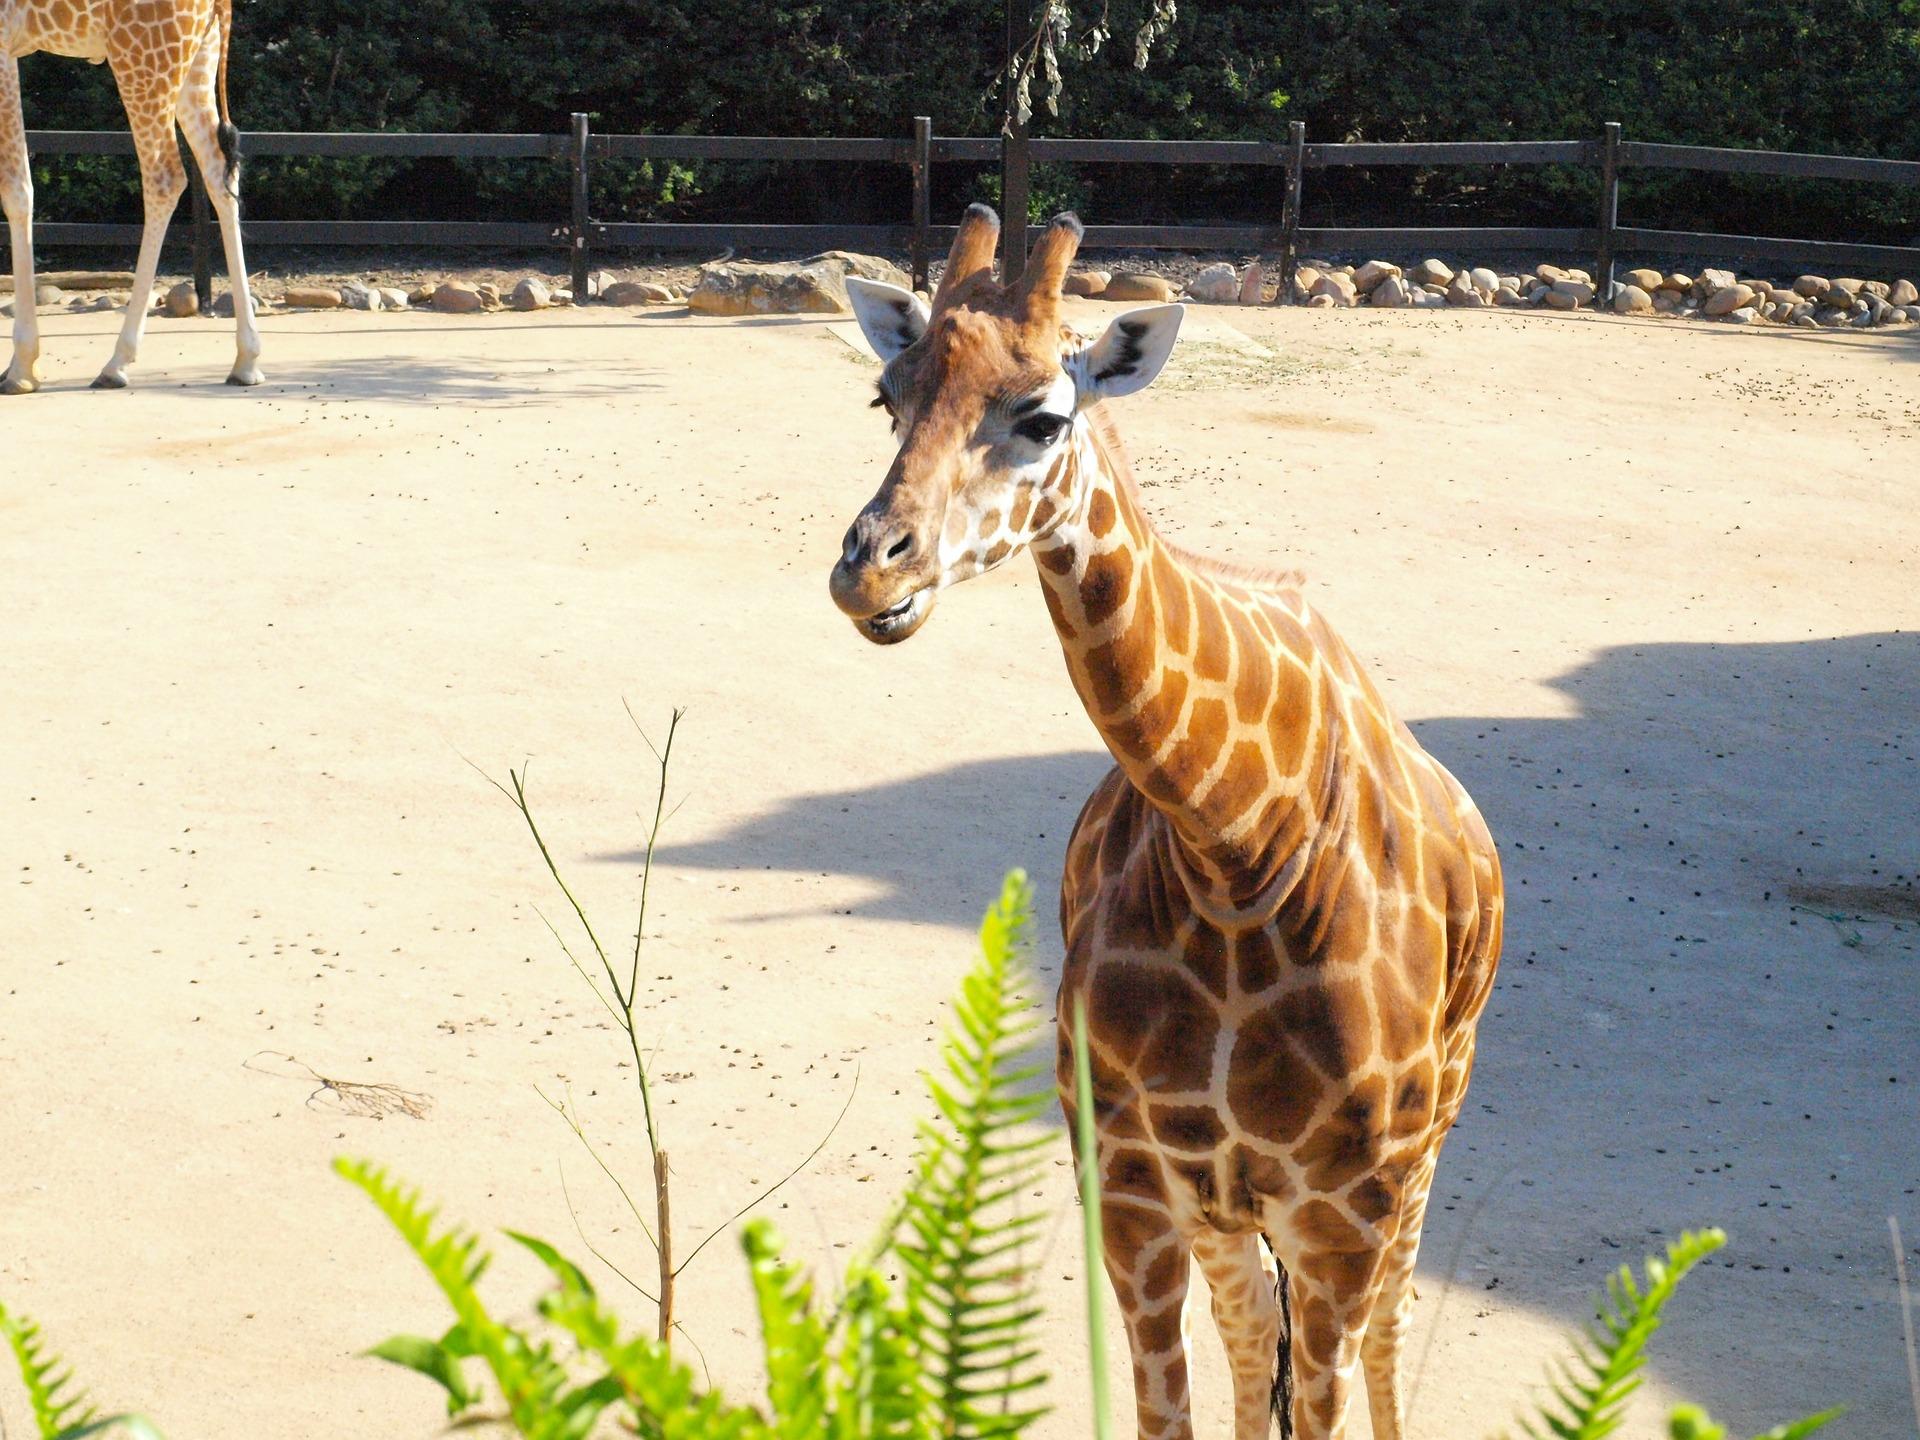 Giraffe at Taronga Zoo, Sydney, Australia